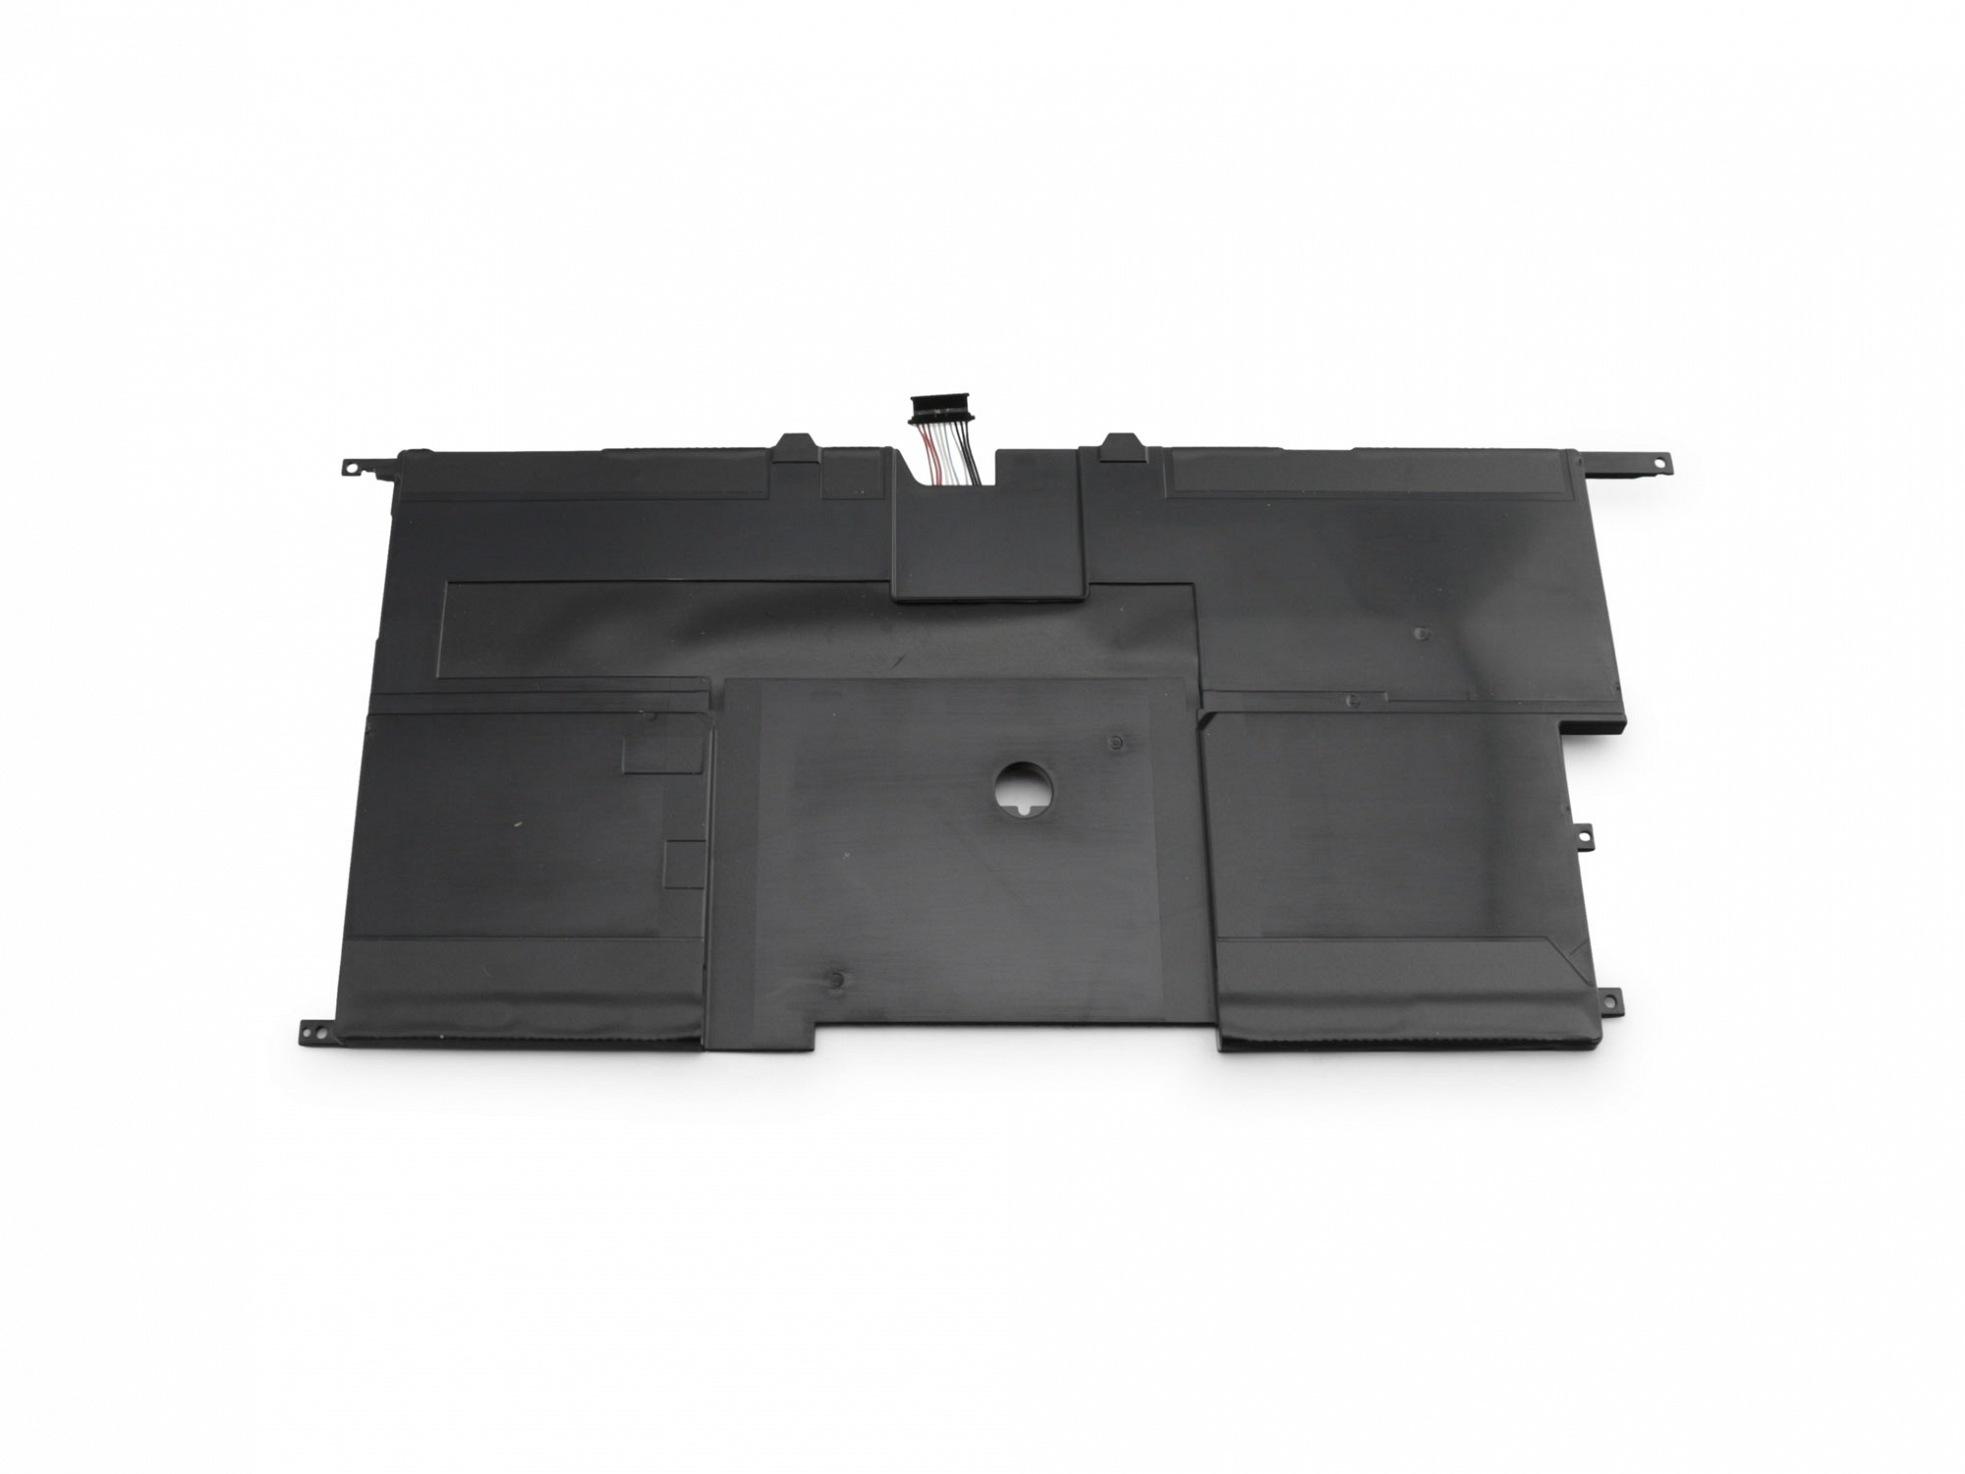 akku 51wh original f r lenovo thinkpad x1 carbon 20bs. Black Bedroom Furniture Sets. Home Design Ideas